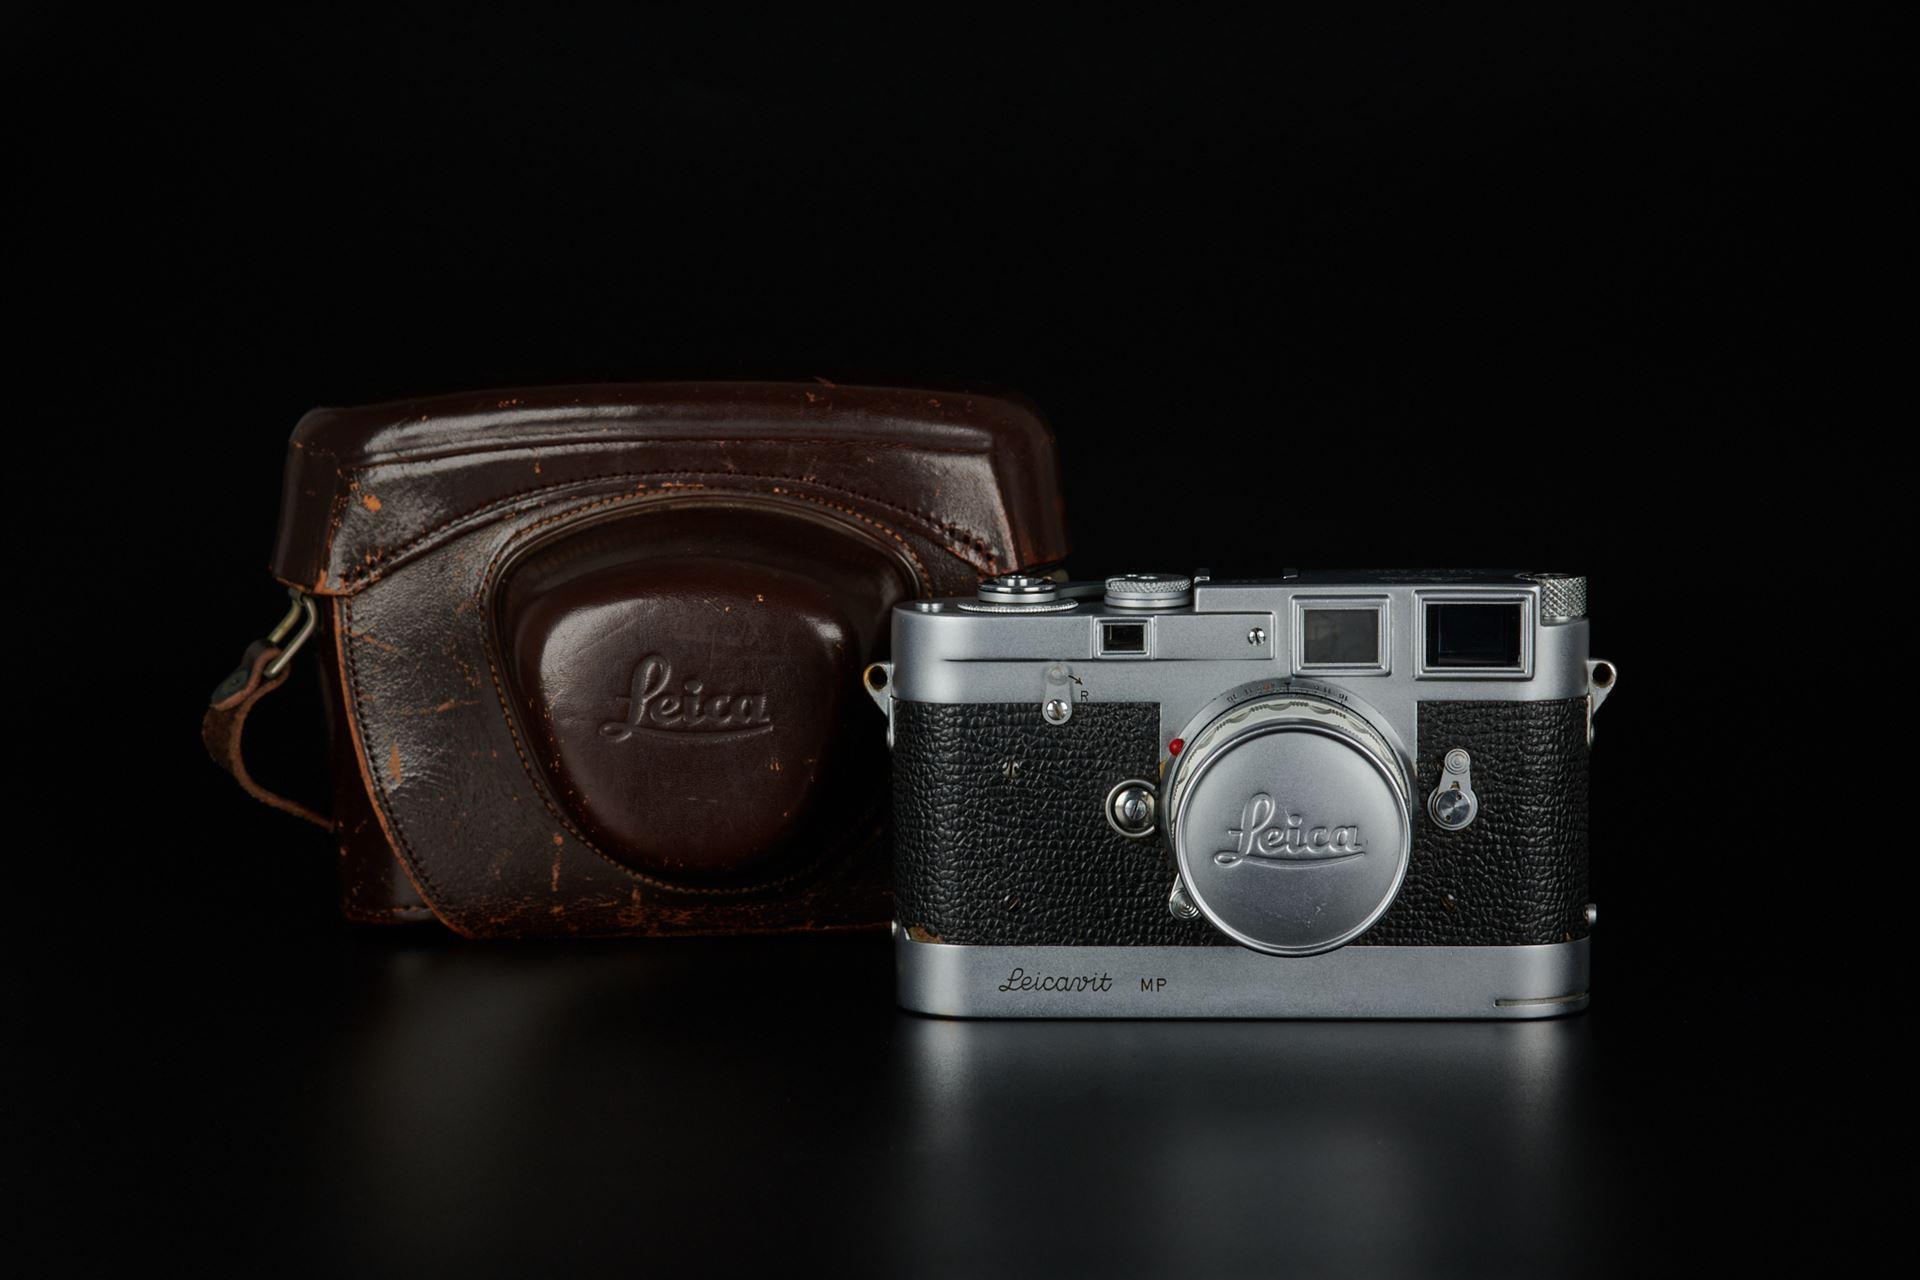 Picture of leica original mp-292 chrome